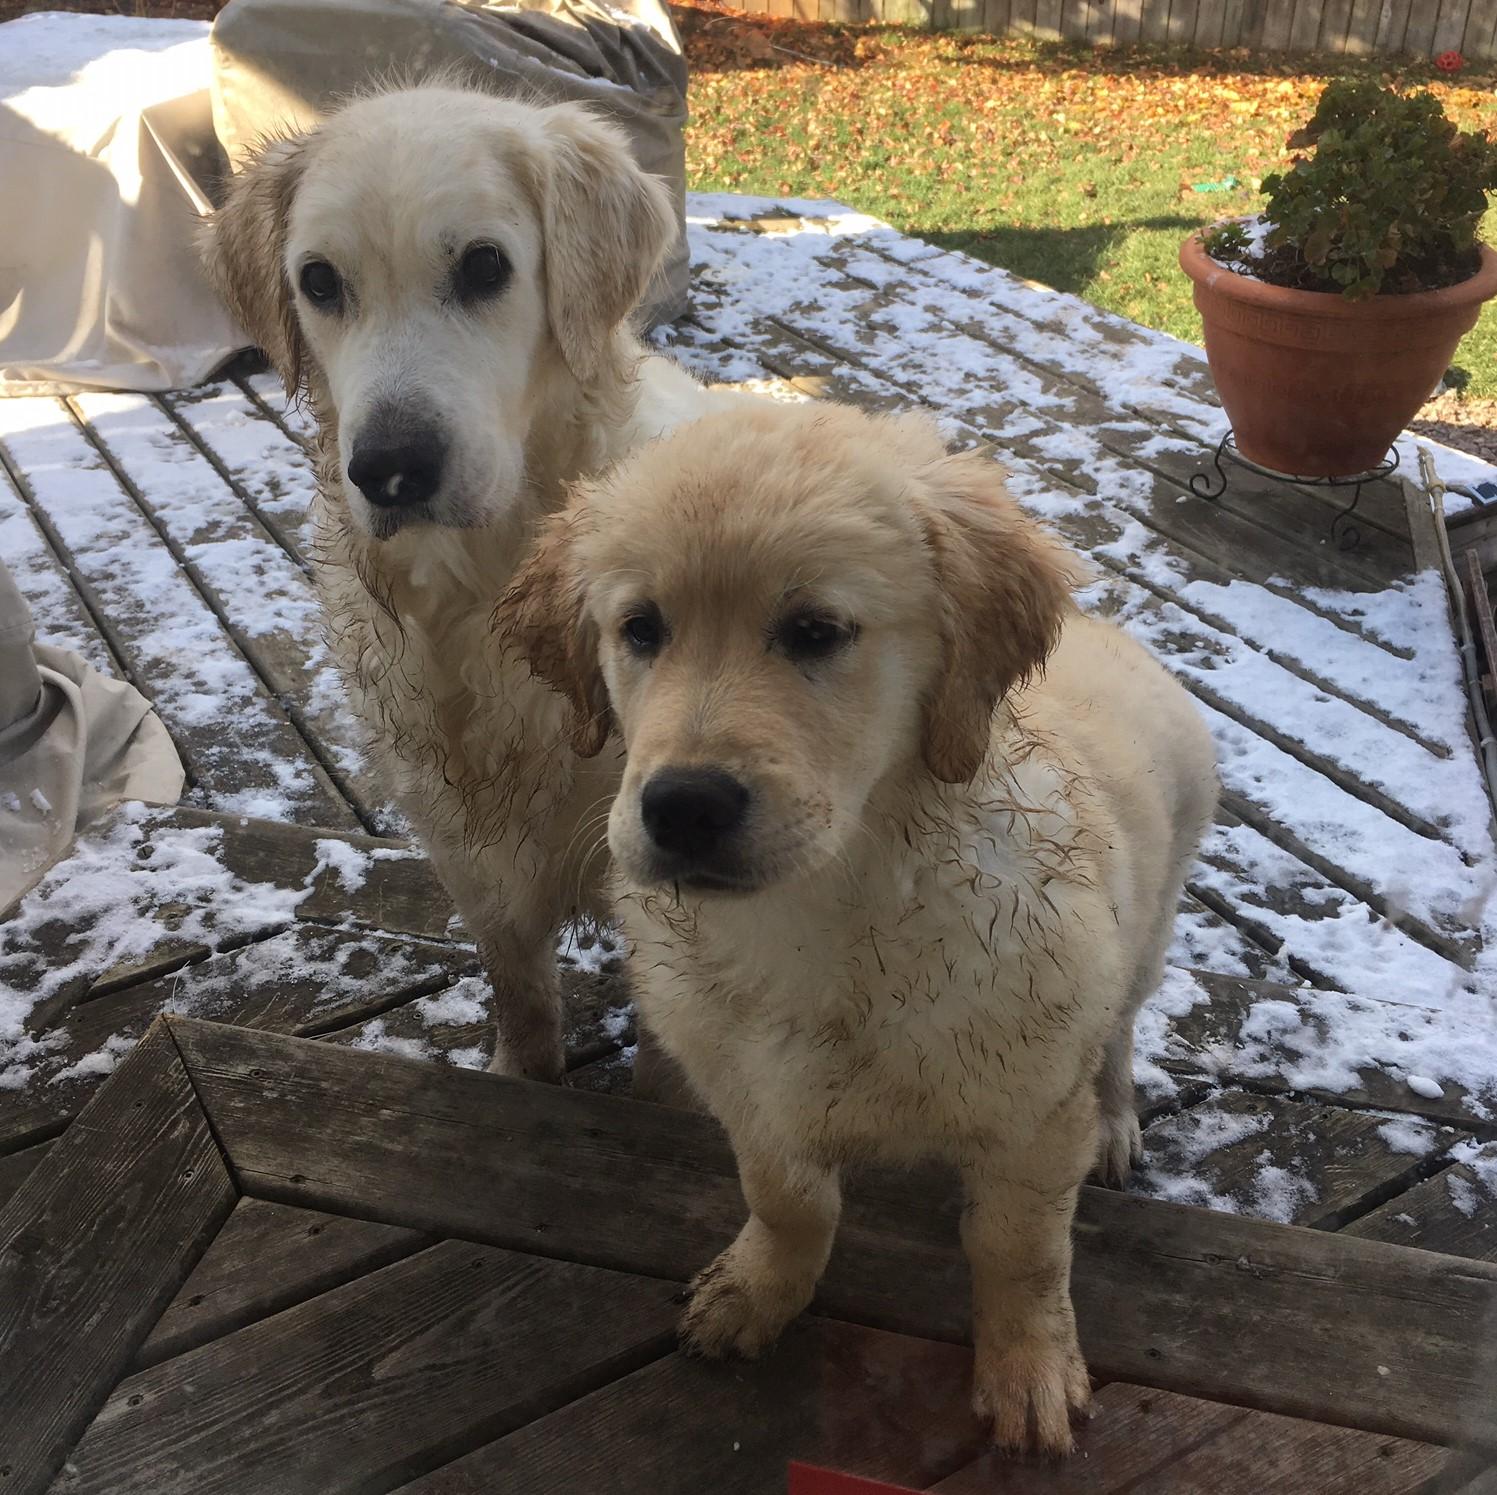 2 muuddy dogs, deck